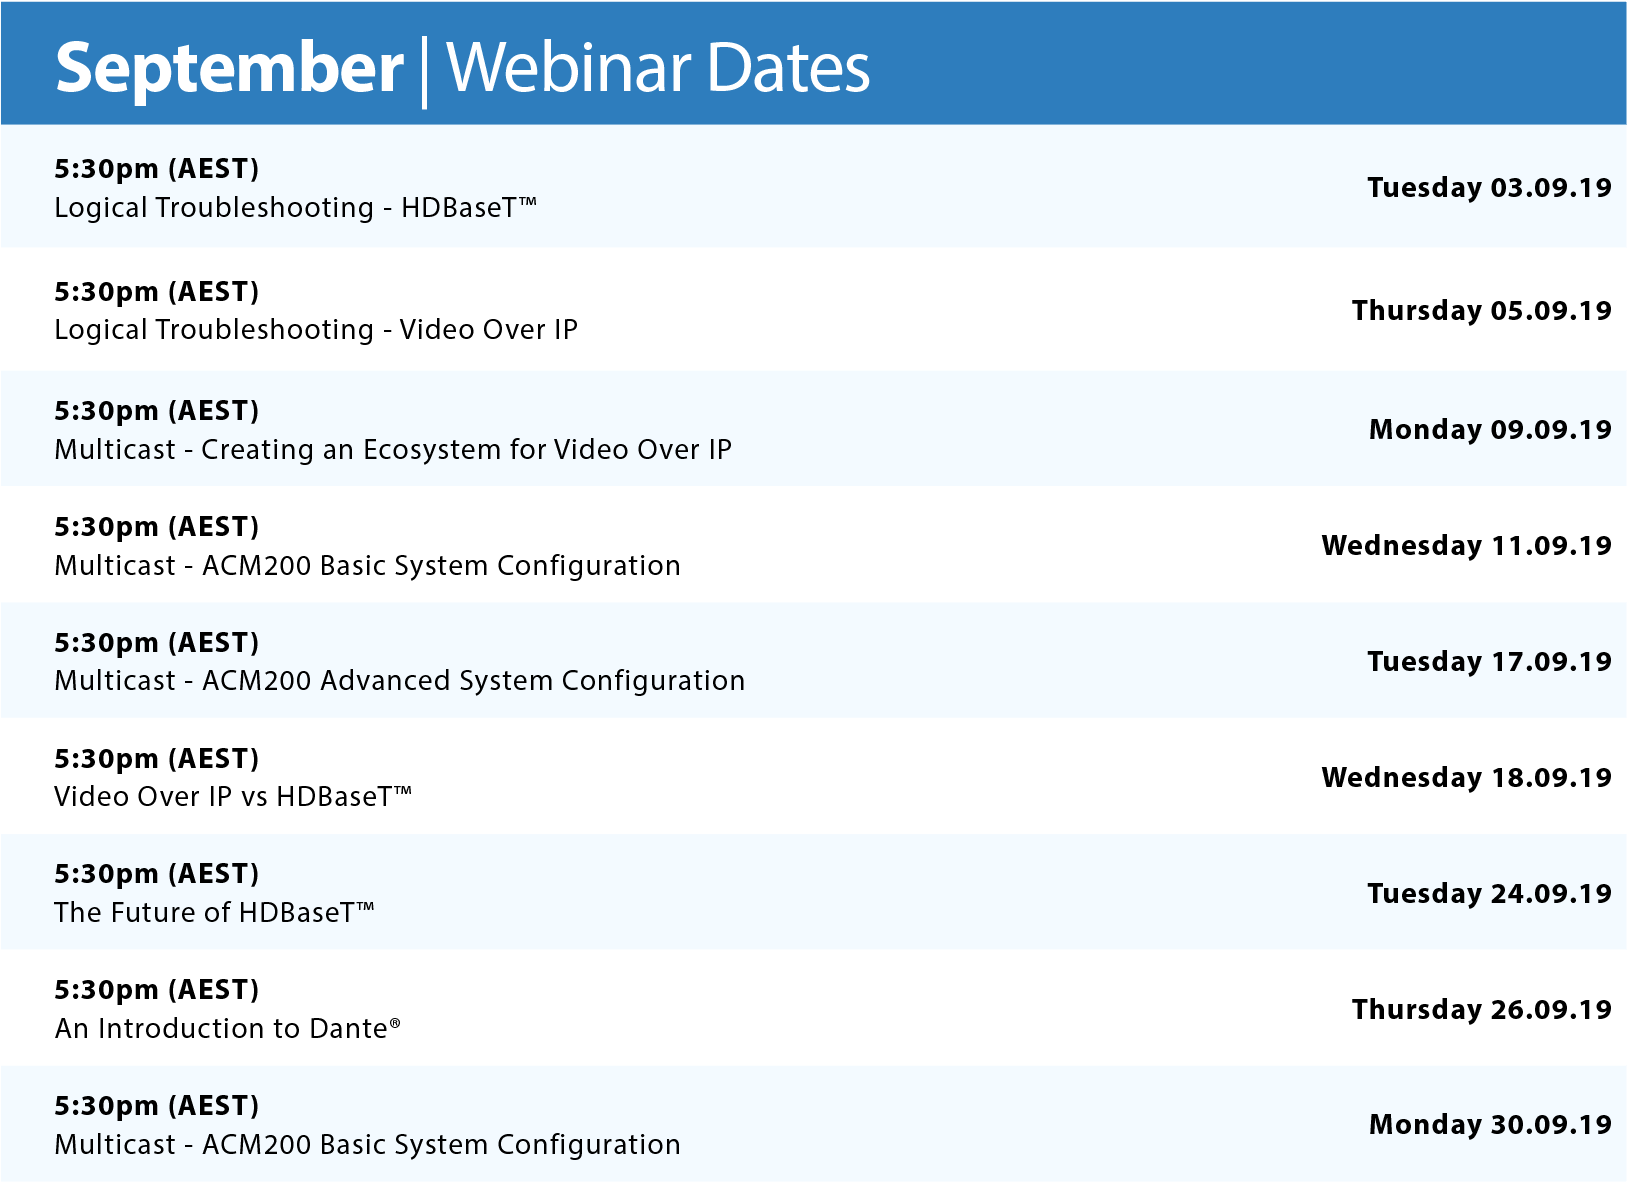 AUS_SEP_Webinar_Dates.png